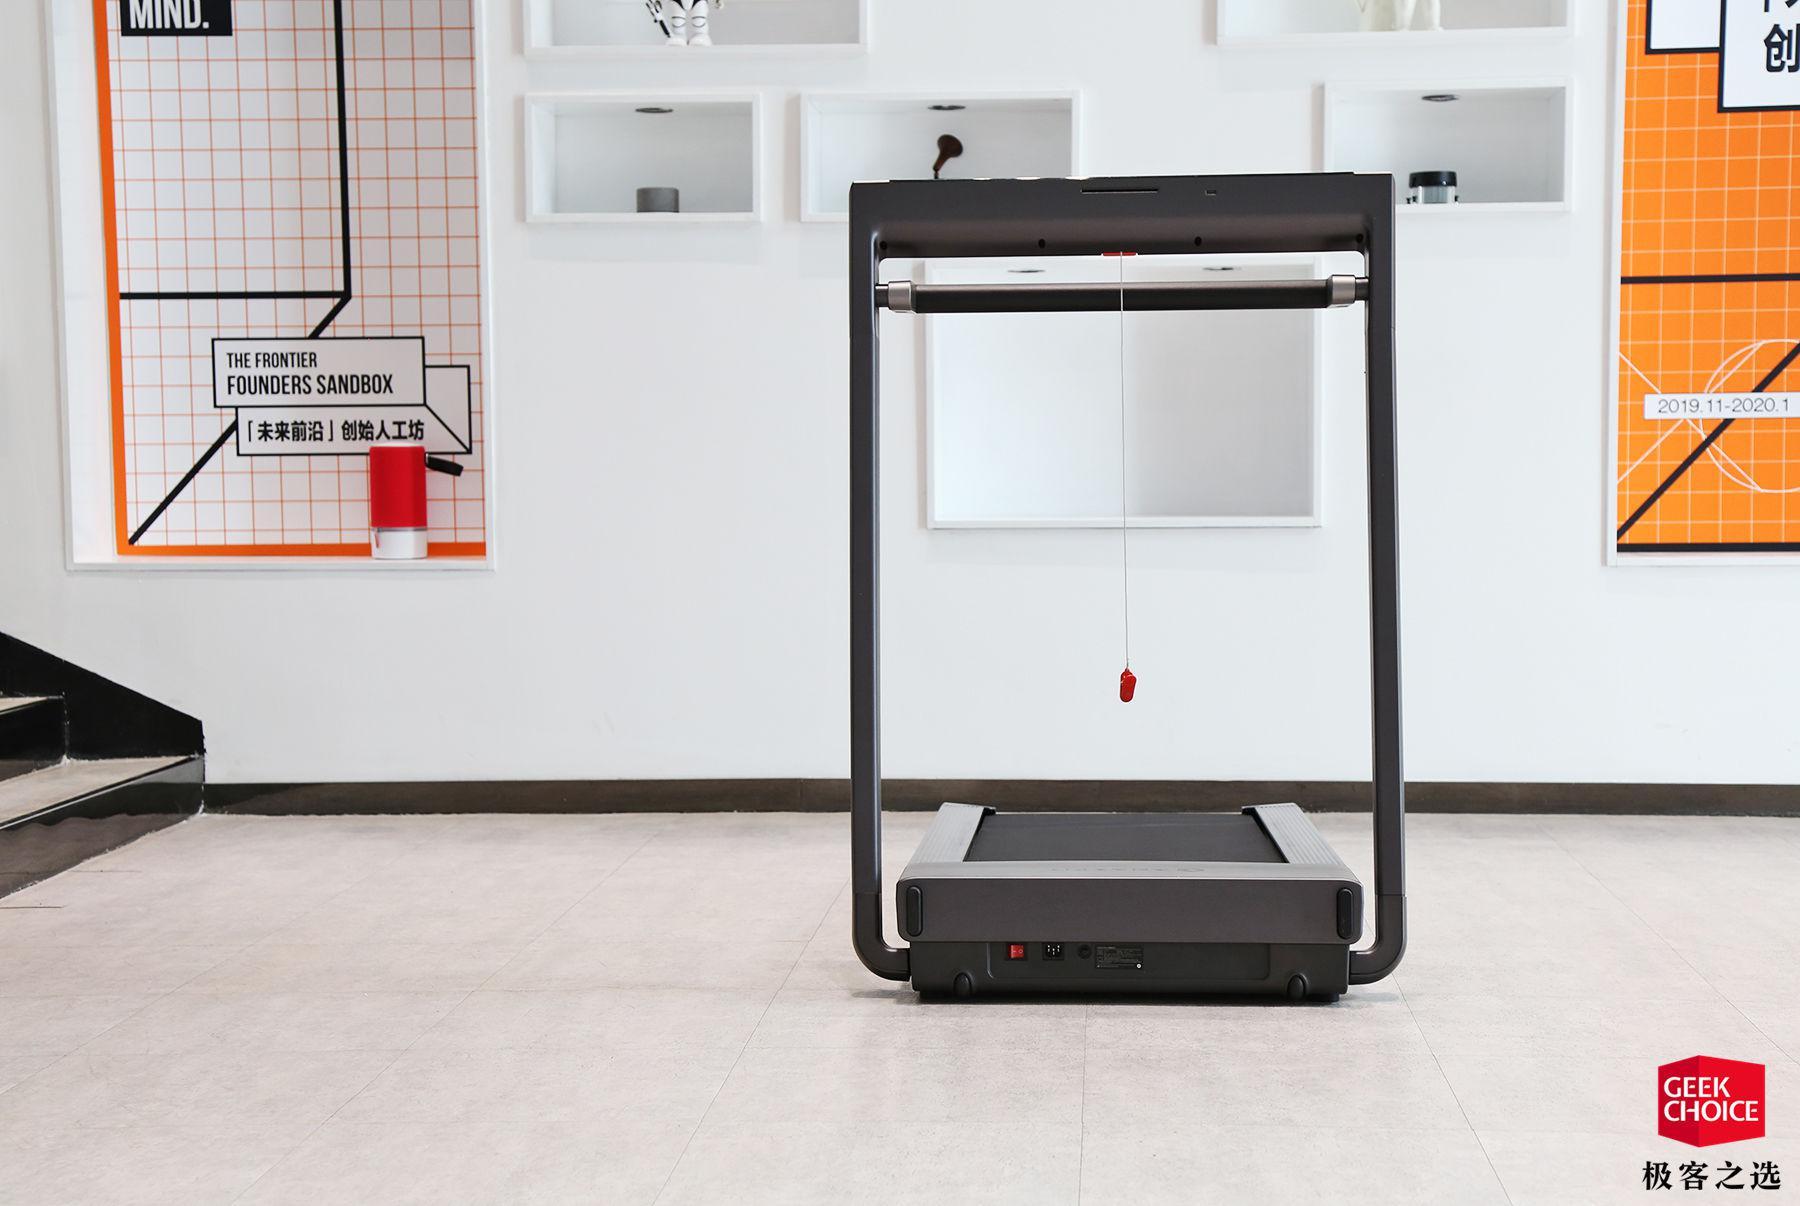 Amazfit AirRun 體驗:自帶雙 JBL 音箱還能顯示心率,年輕人的第一臺跑步機?